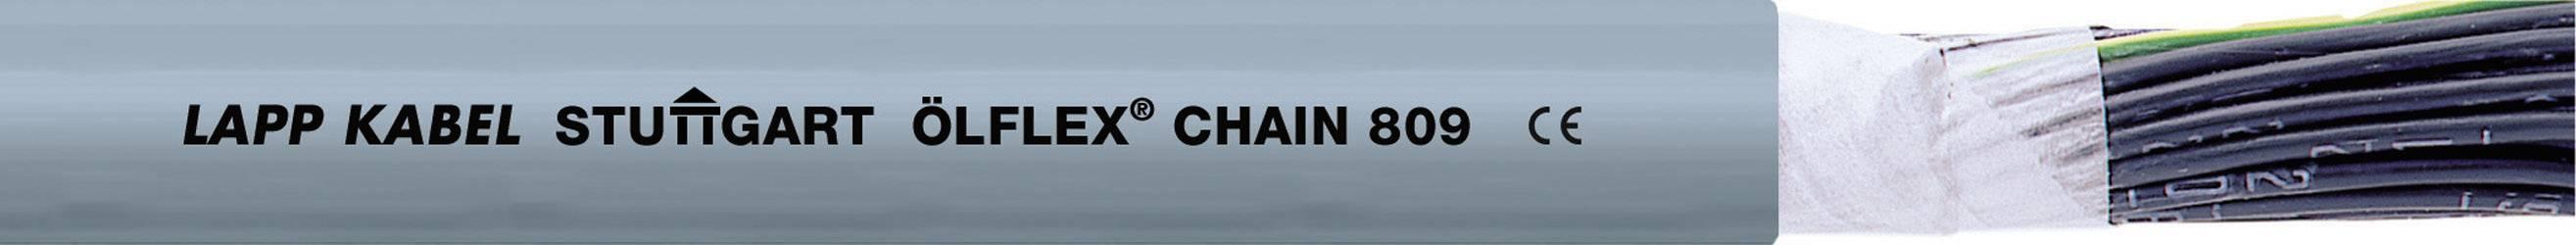 Žíla kabelu LappKabel ÖLFLEX CHAIN 809 2X1,5 (1026724), 2x 1,5 mm², PVC, Ø 6,5 mm, 100 m, šedá